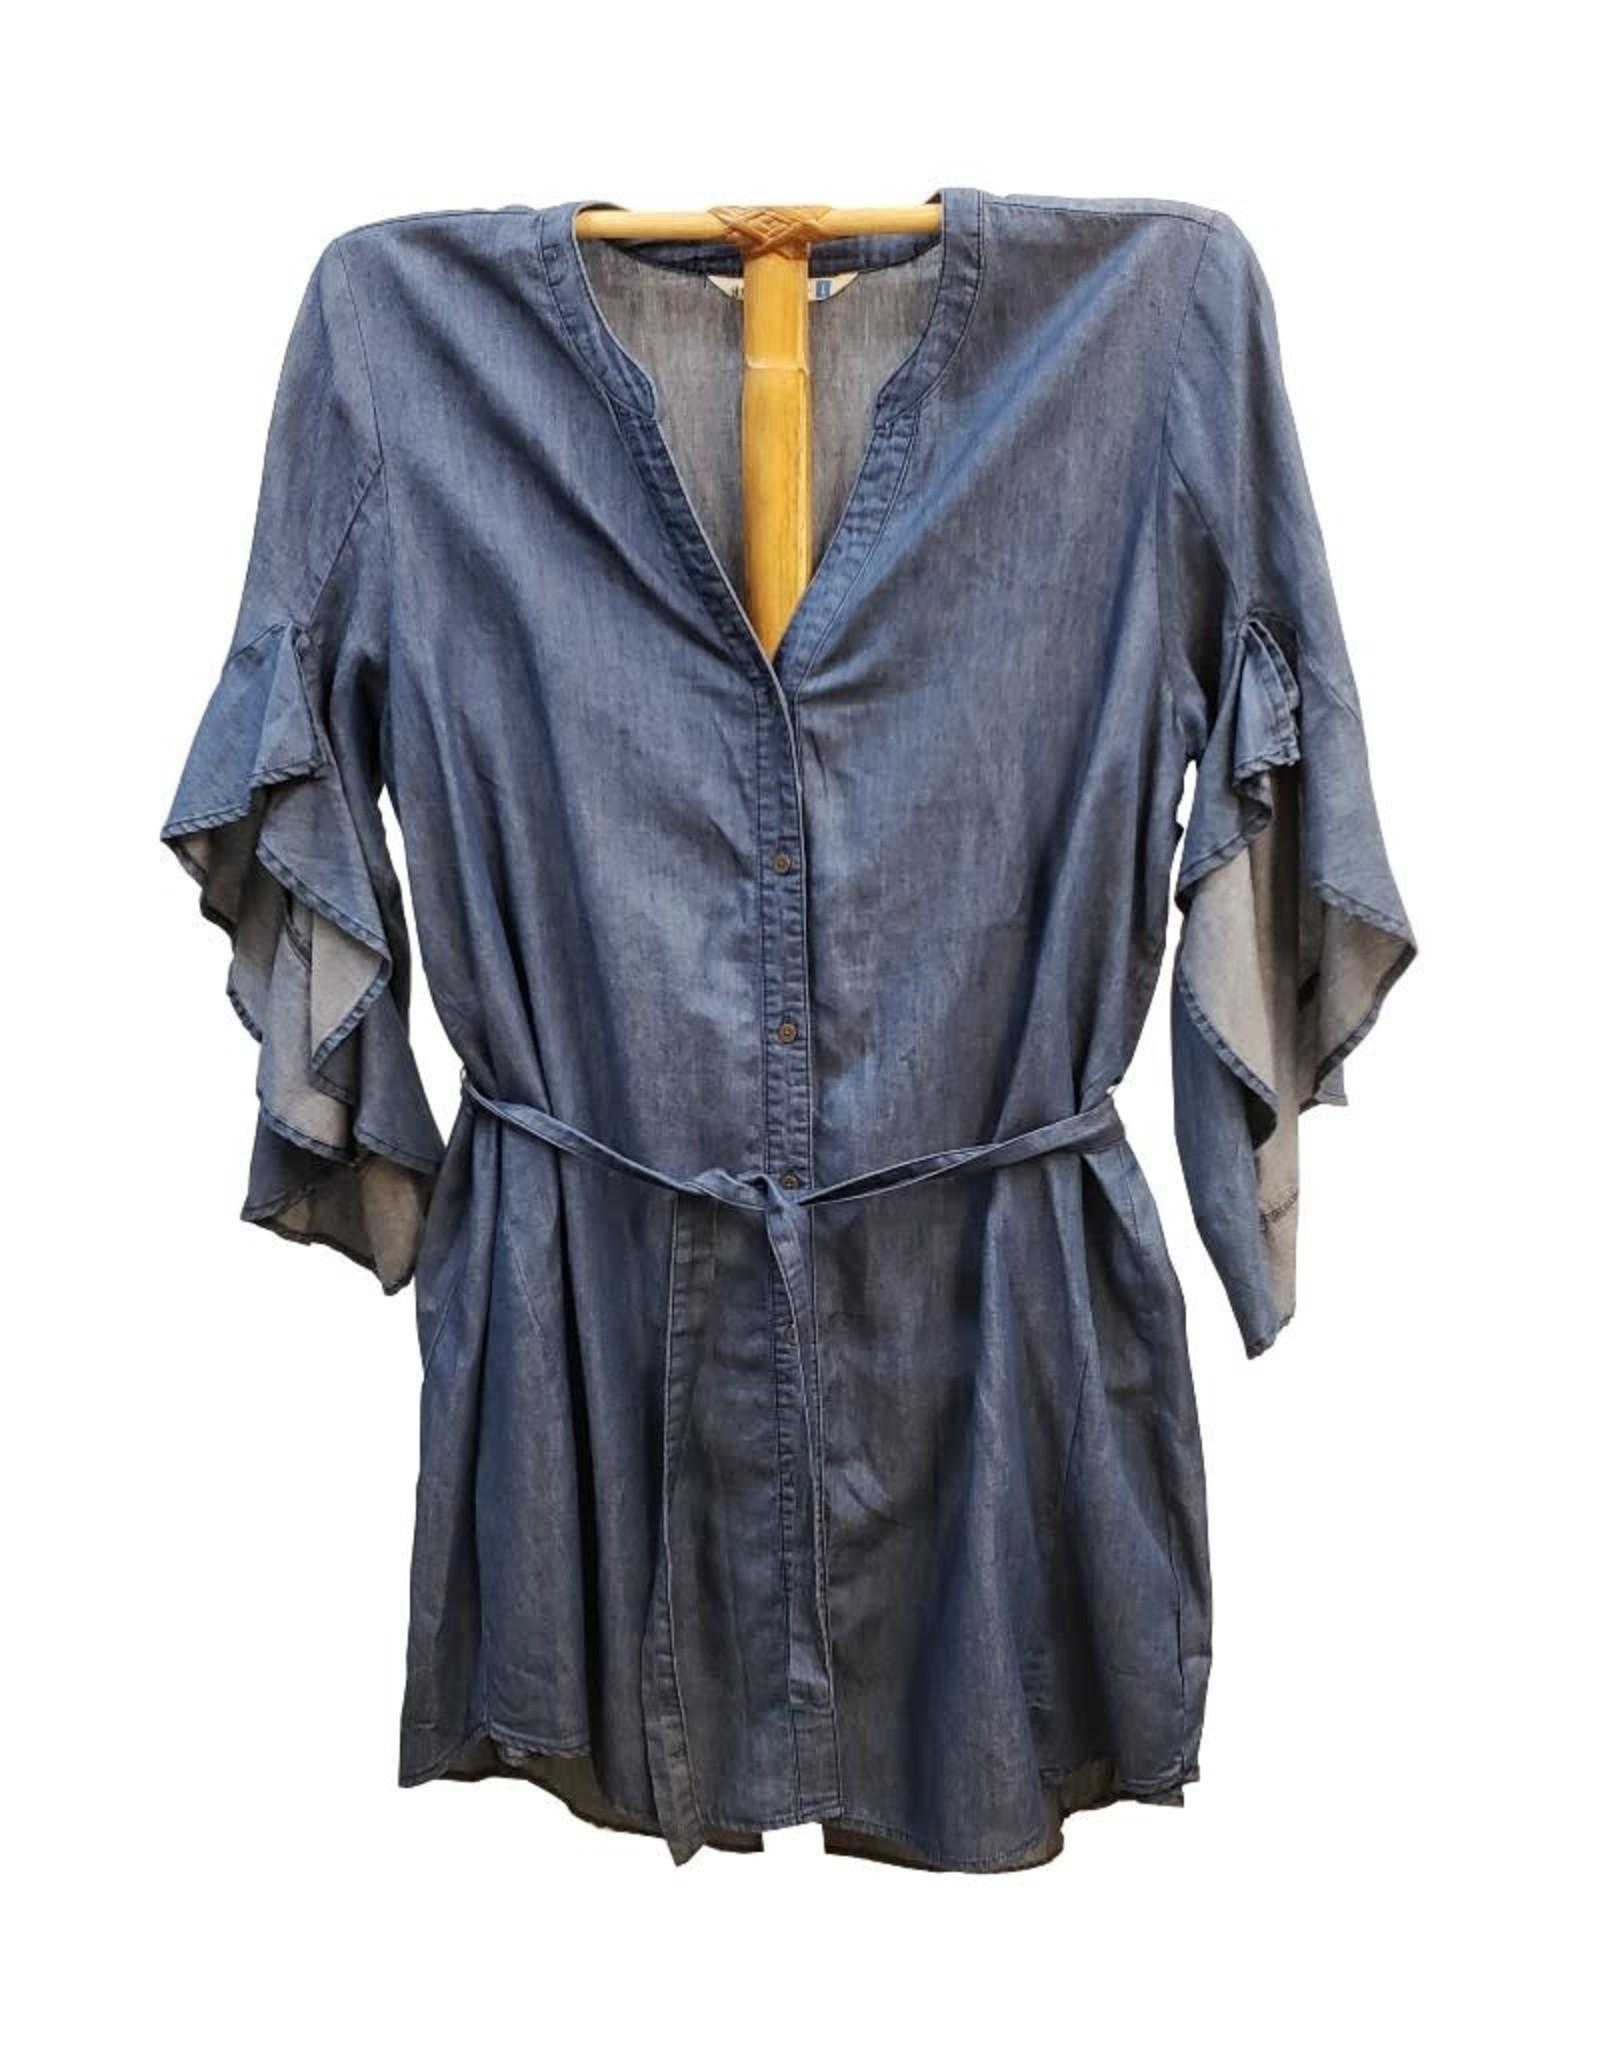 Given Kale Ruffle Sleeve Dress